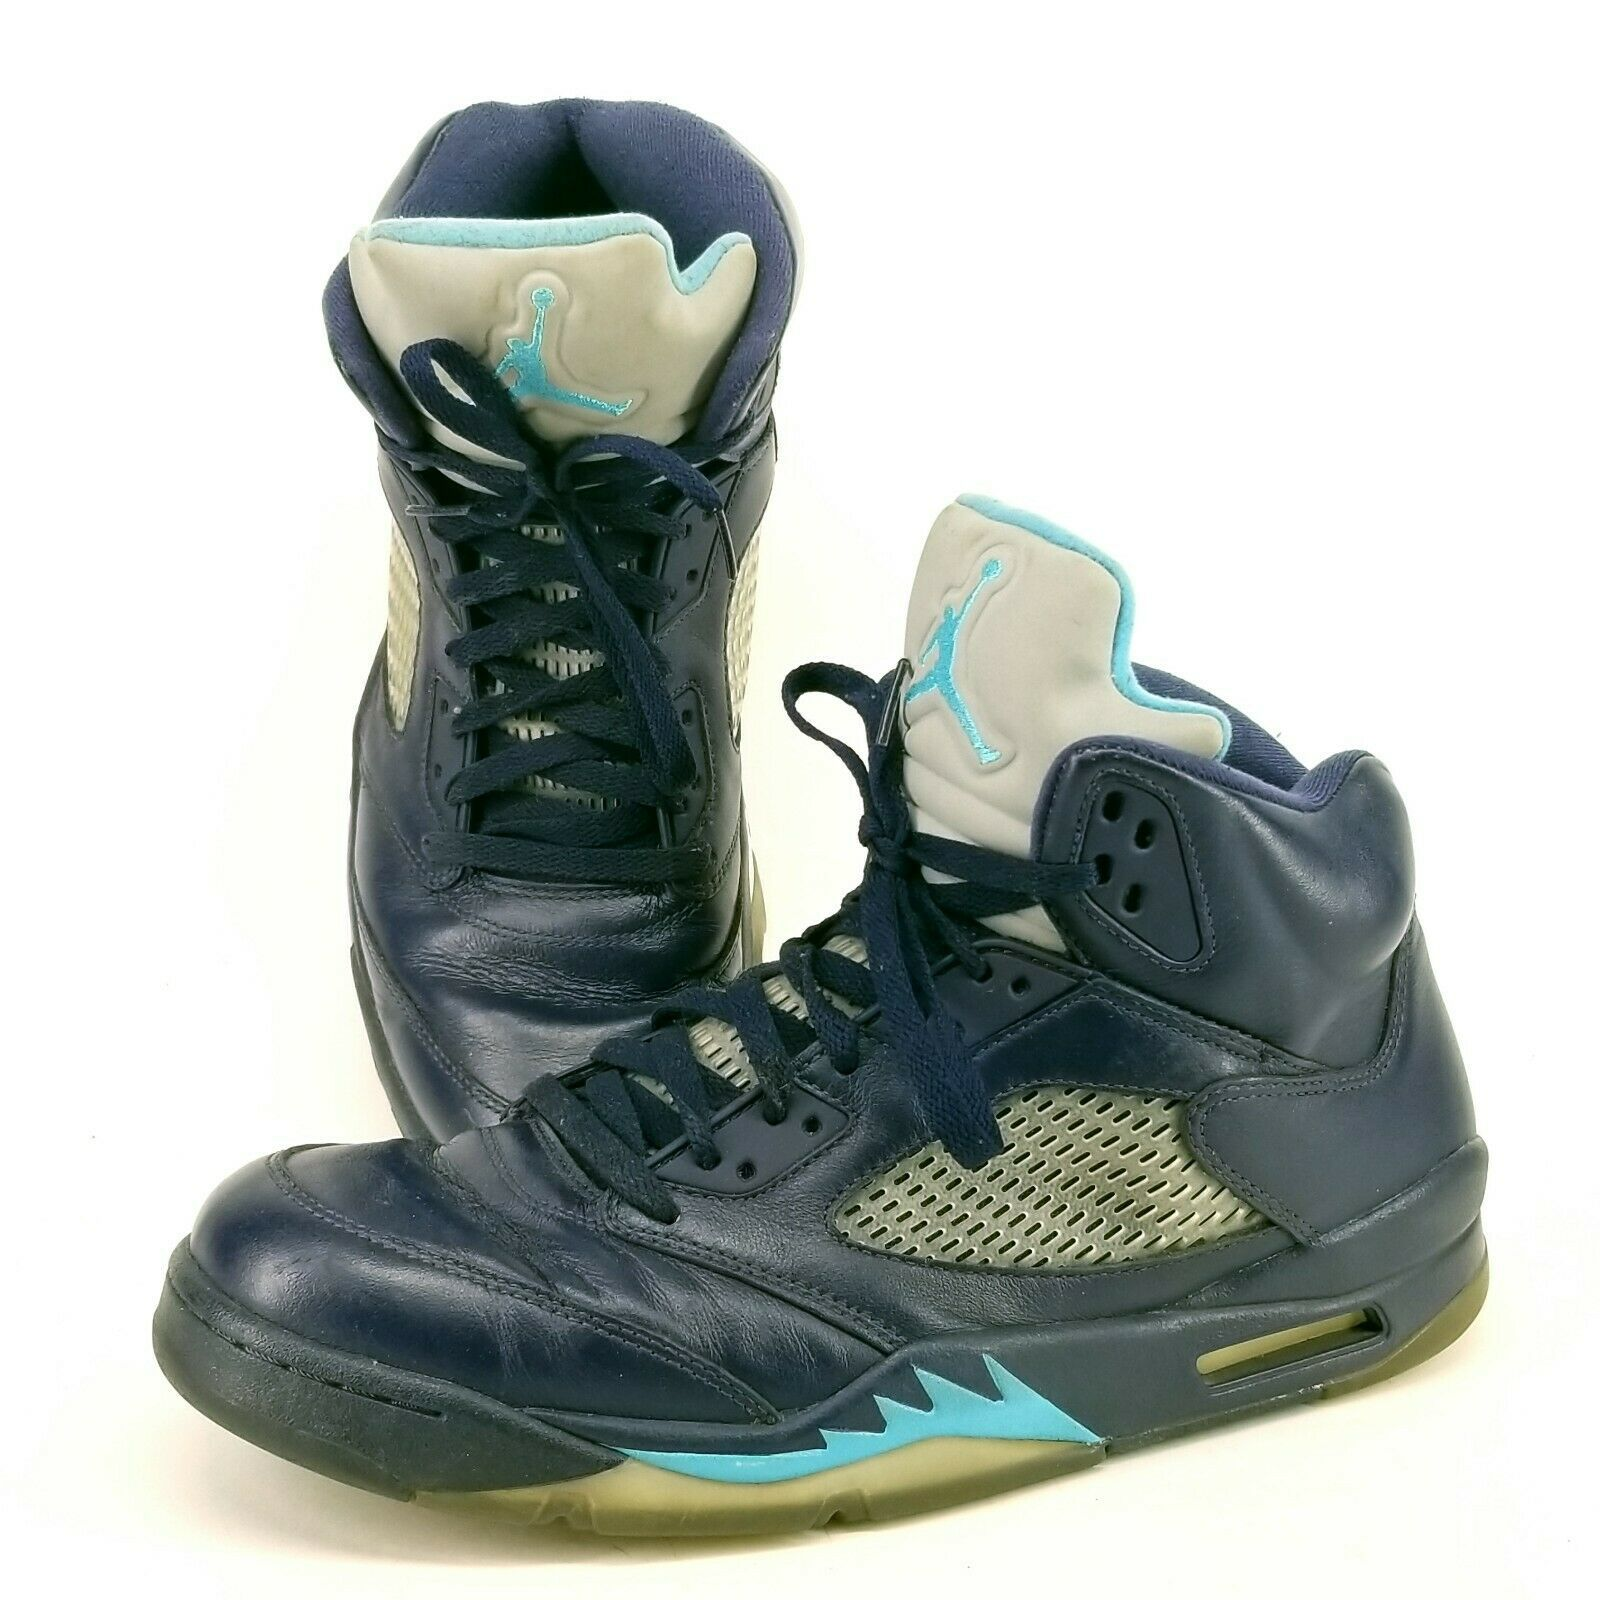 listing listing listing Shoes1 Flagline Shoes1 Shoes1 Flagline Flagline Flagline Shoes1 QoWCxBerdE